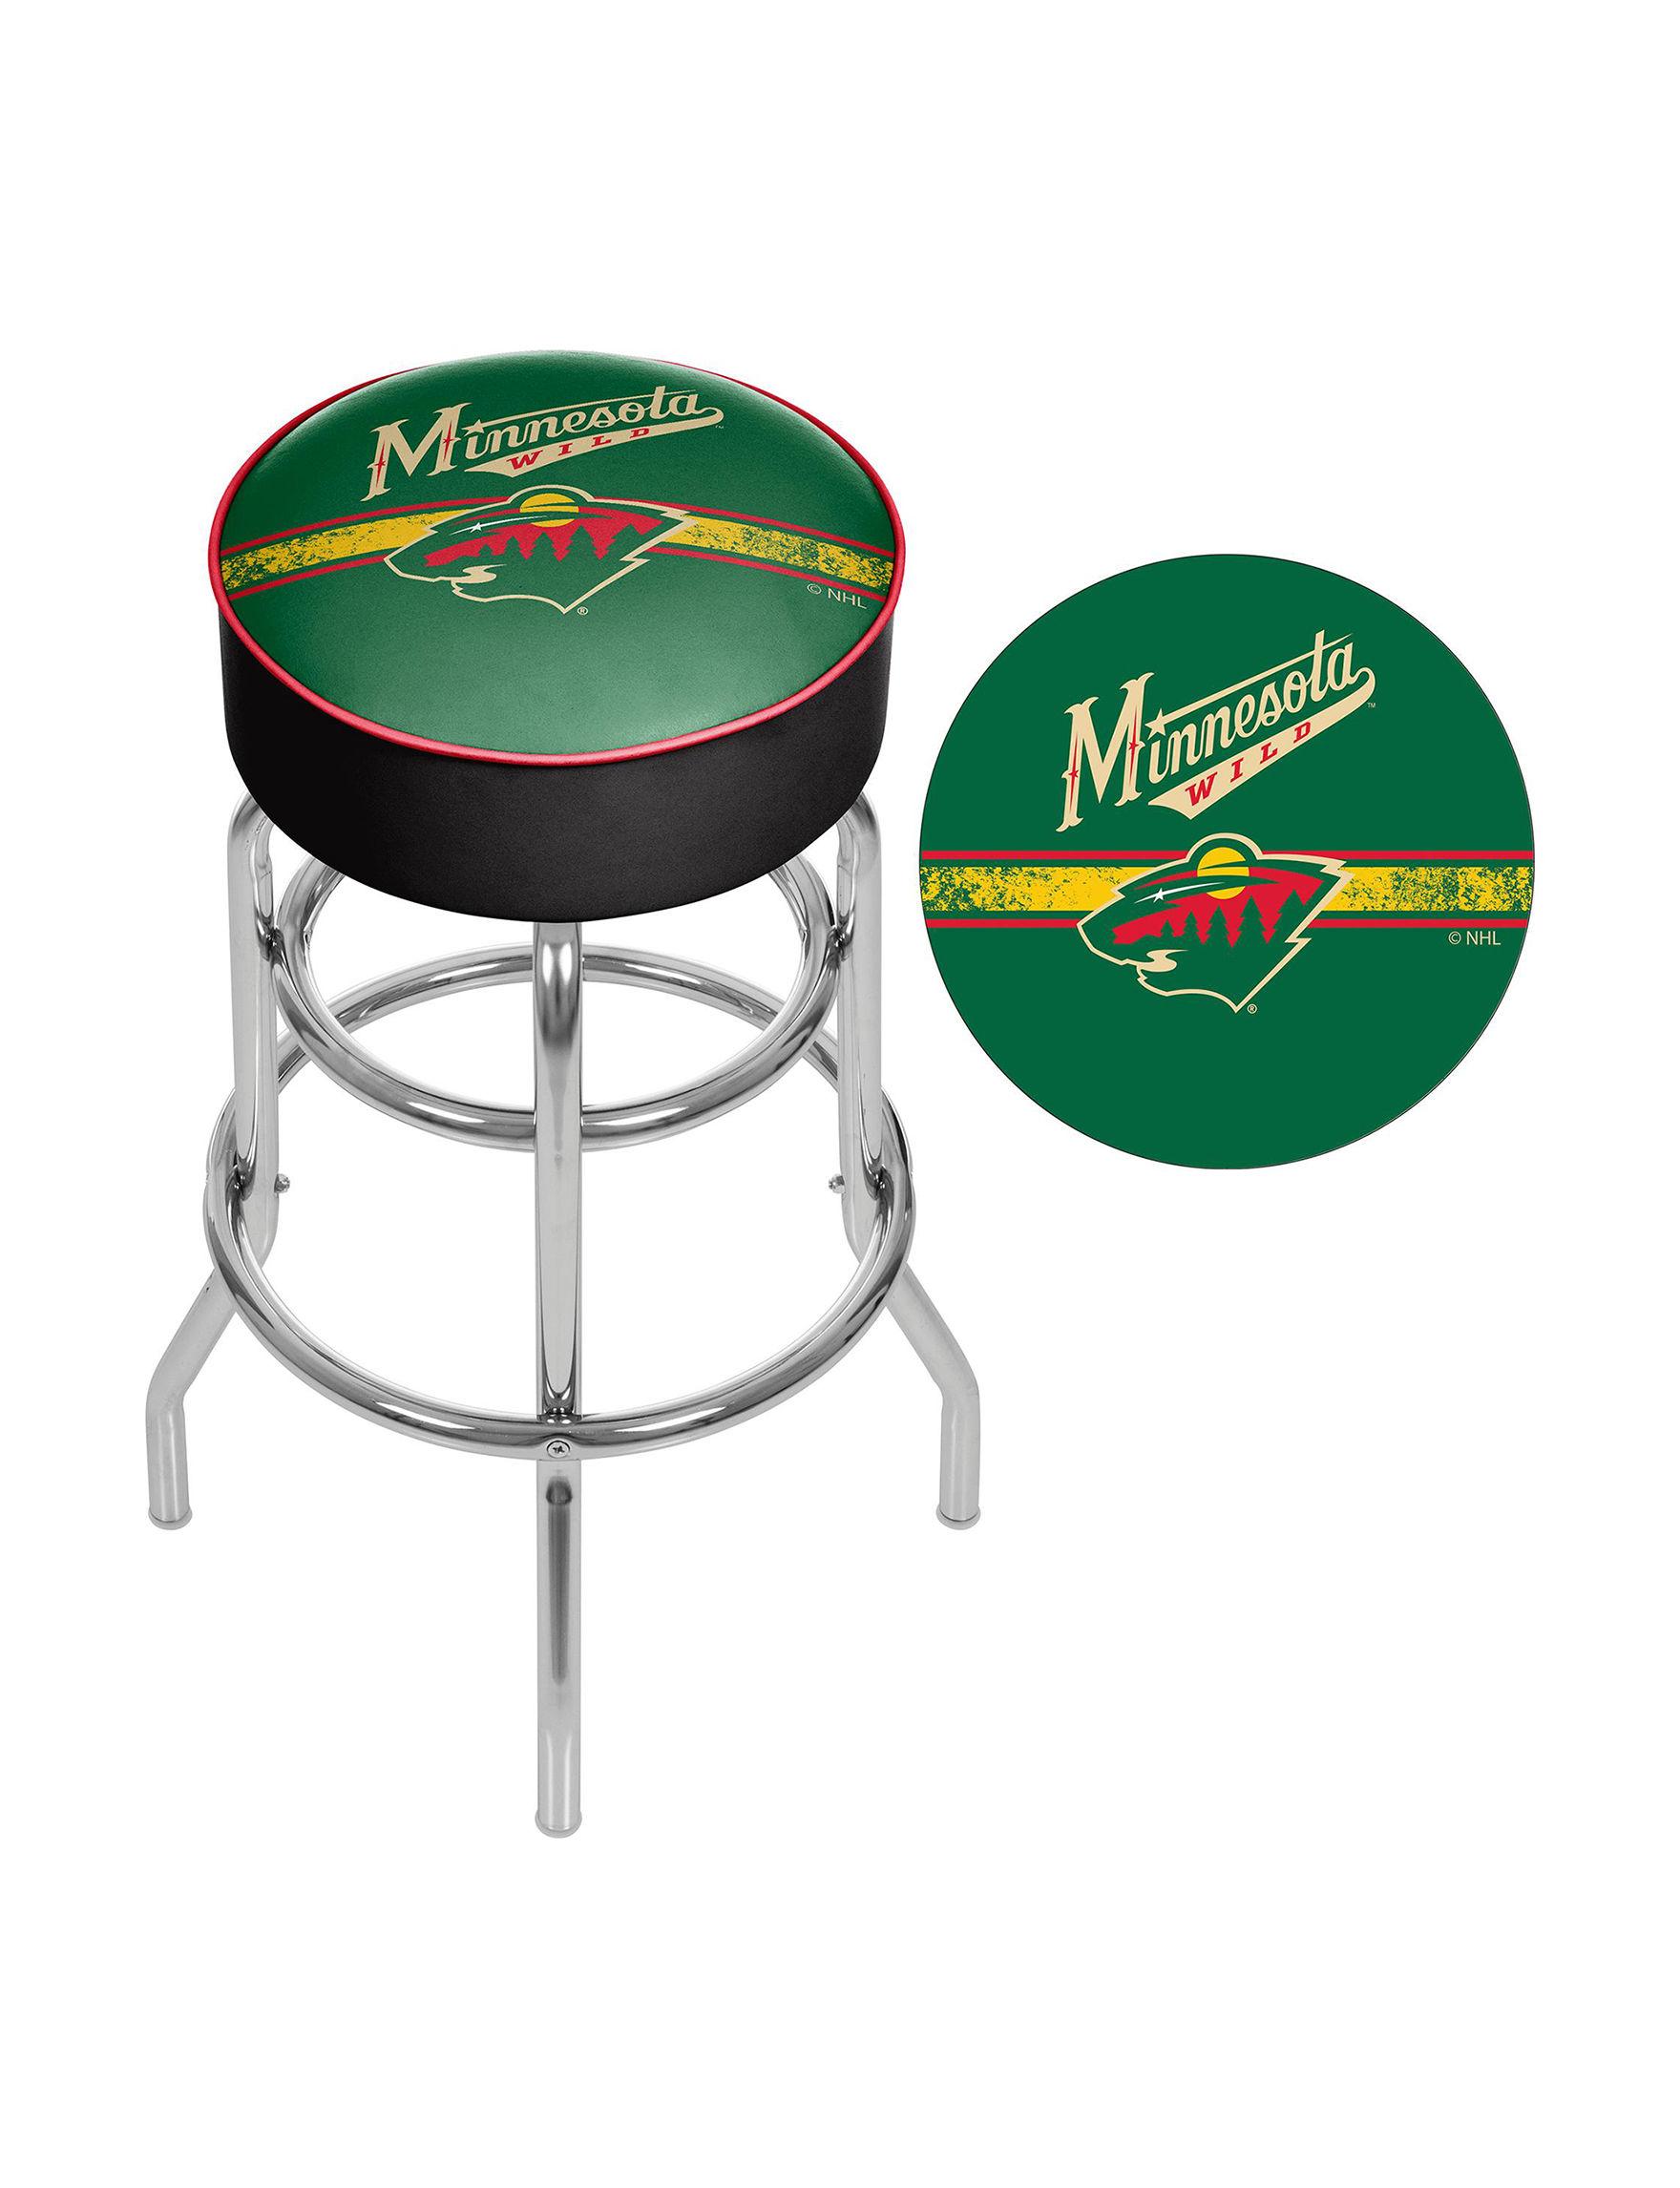 NHL Green Bar & Kitchen Stools Kitchen & Dining Furniture